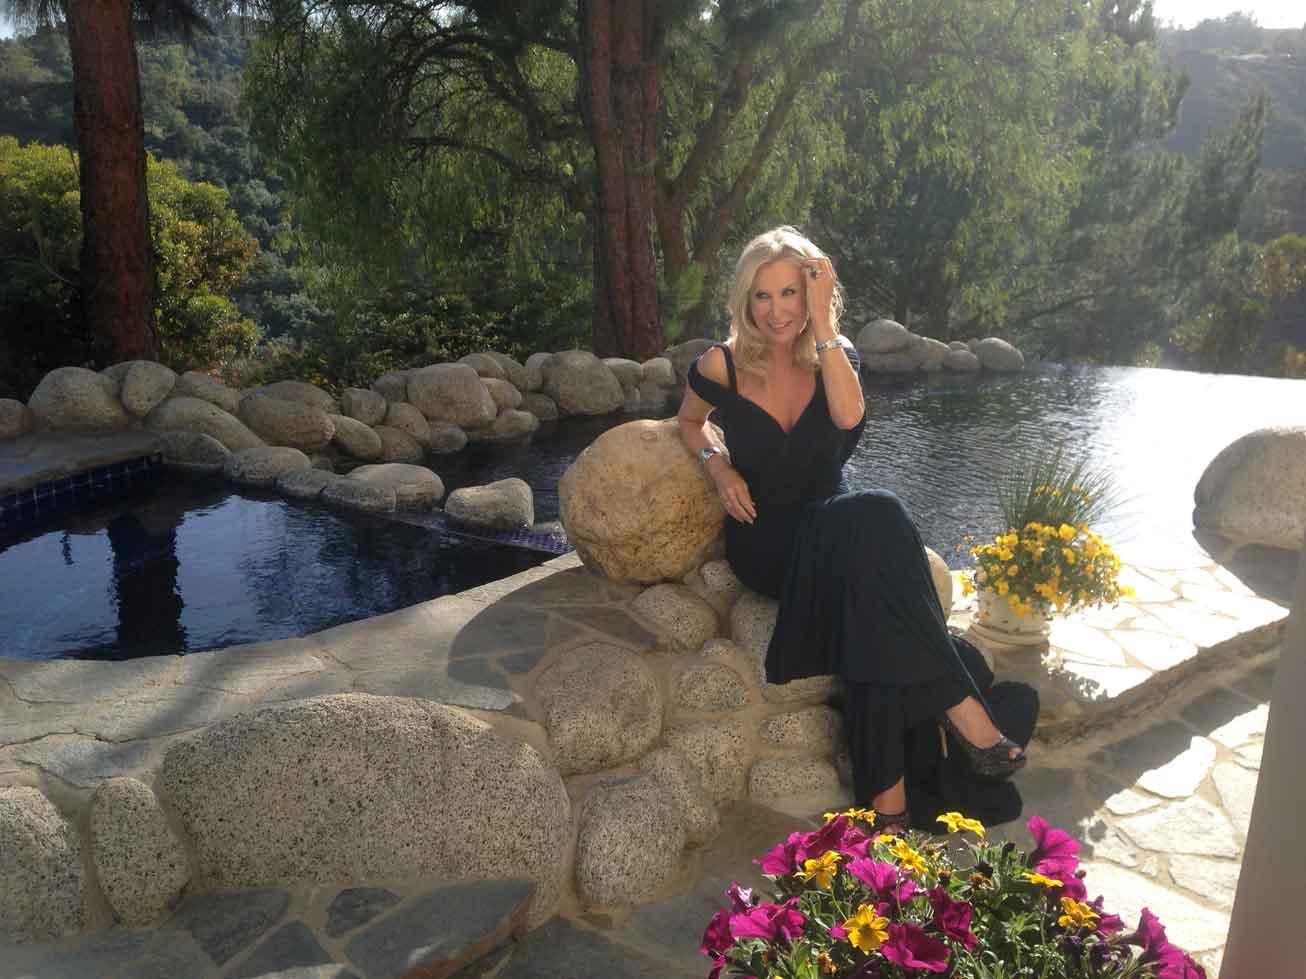 Donna Antebi wearing Donna Karan at her Bel Air home overlooking Los Angeles